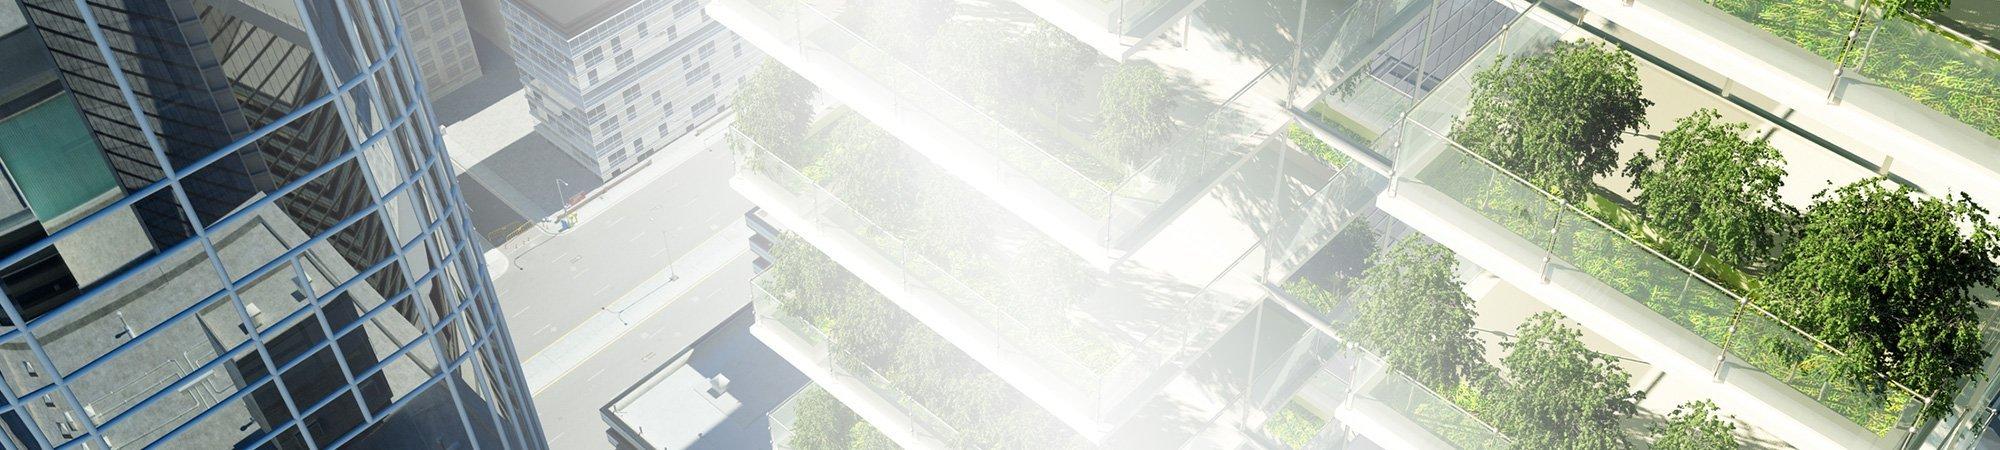 Offre Architecture Durable